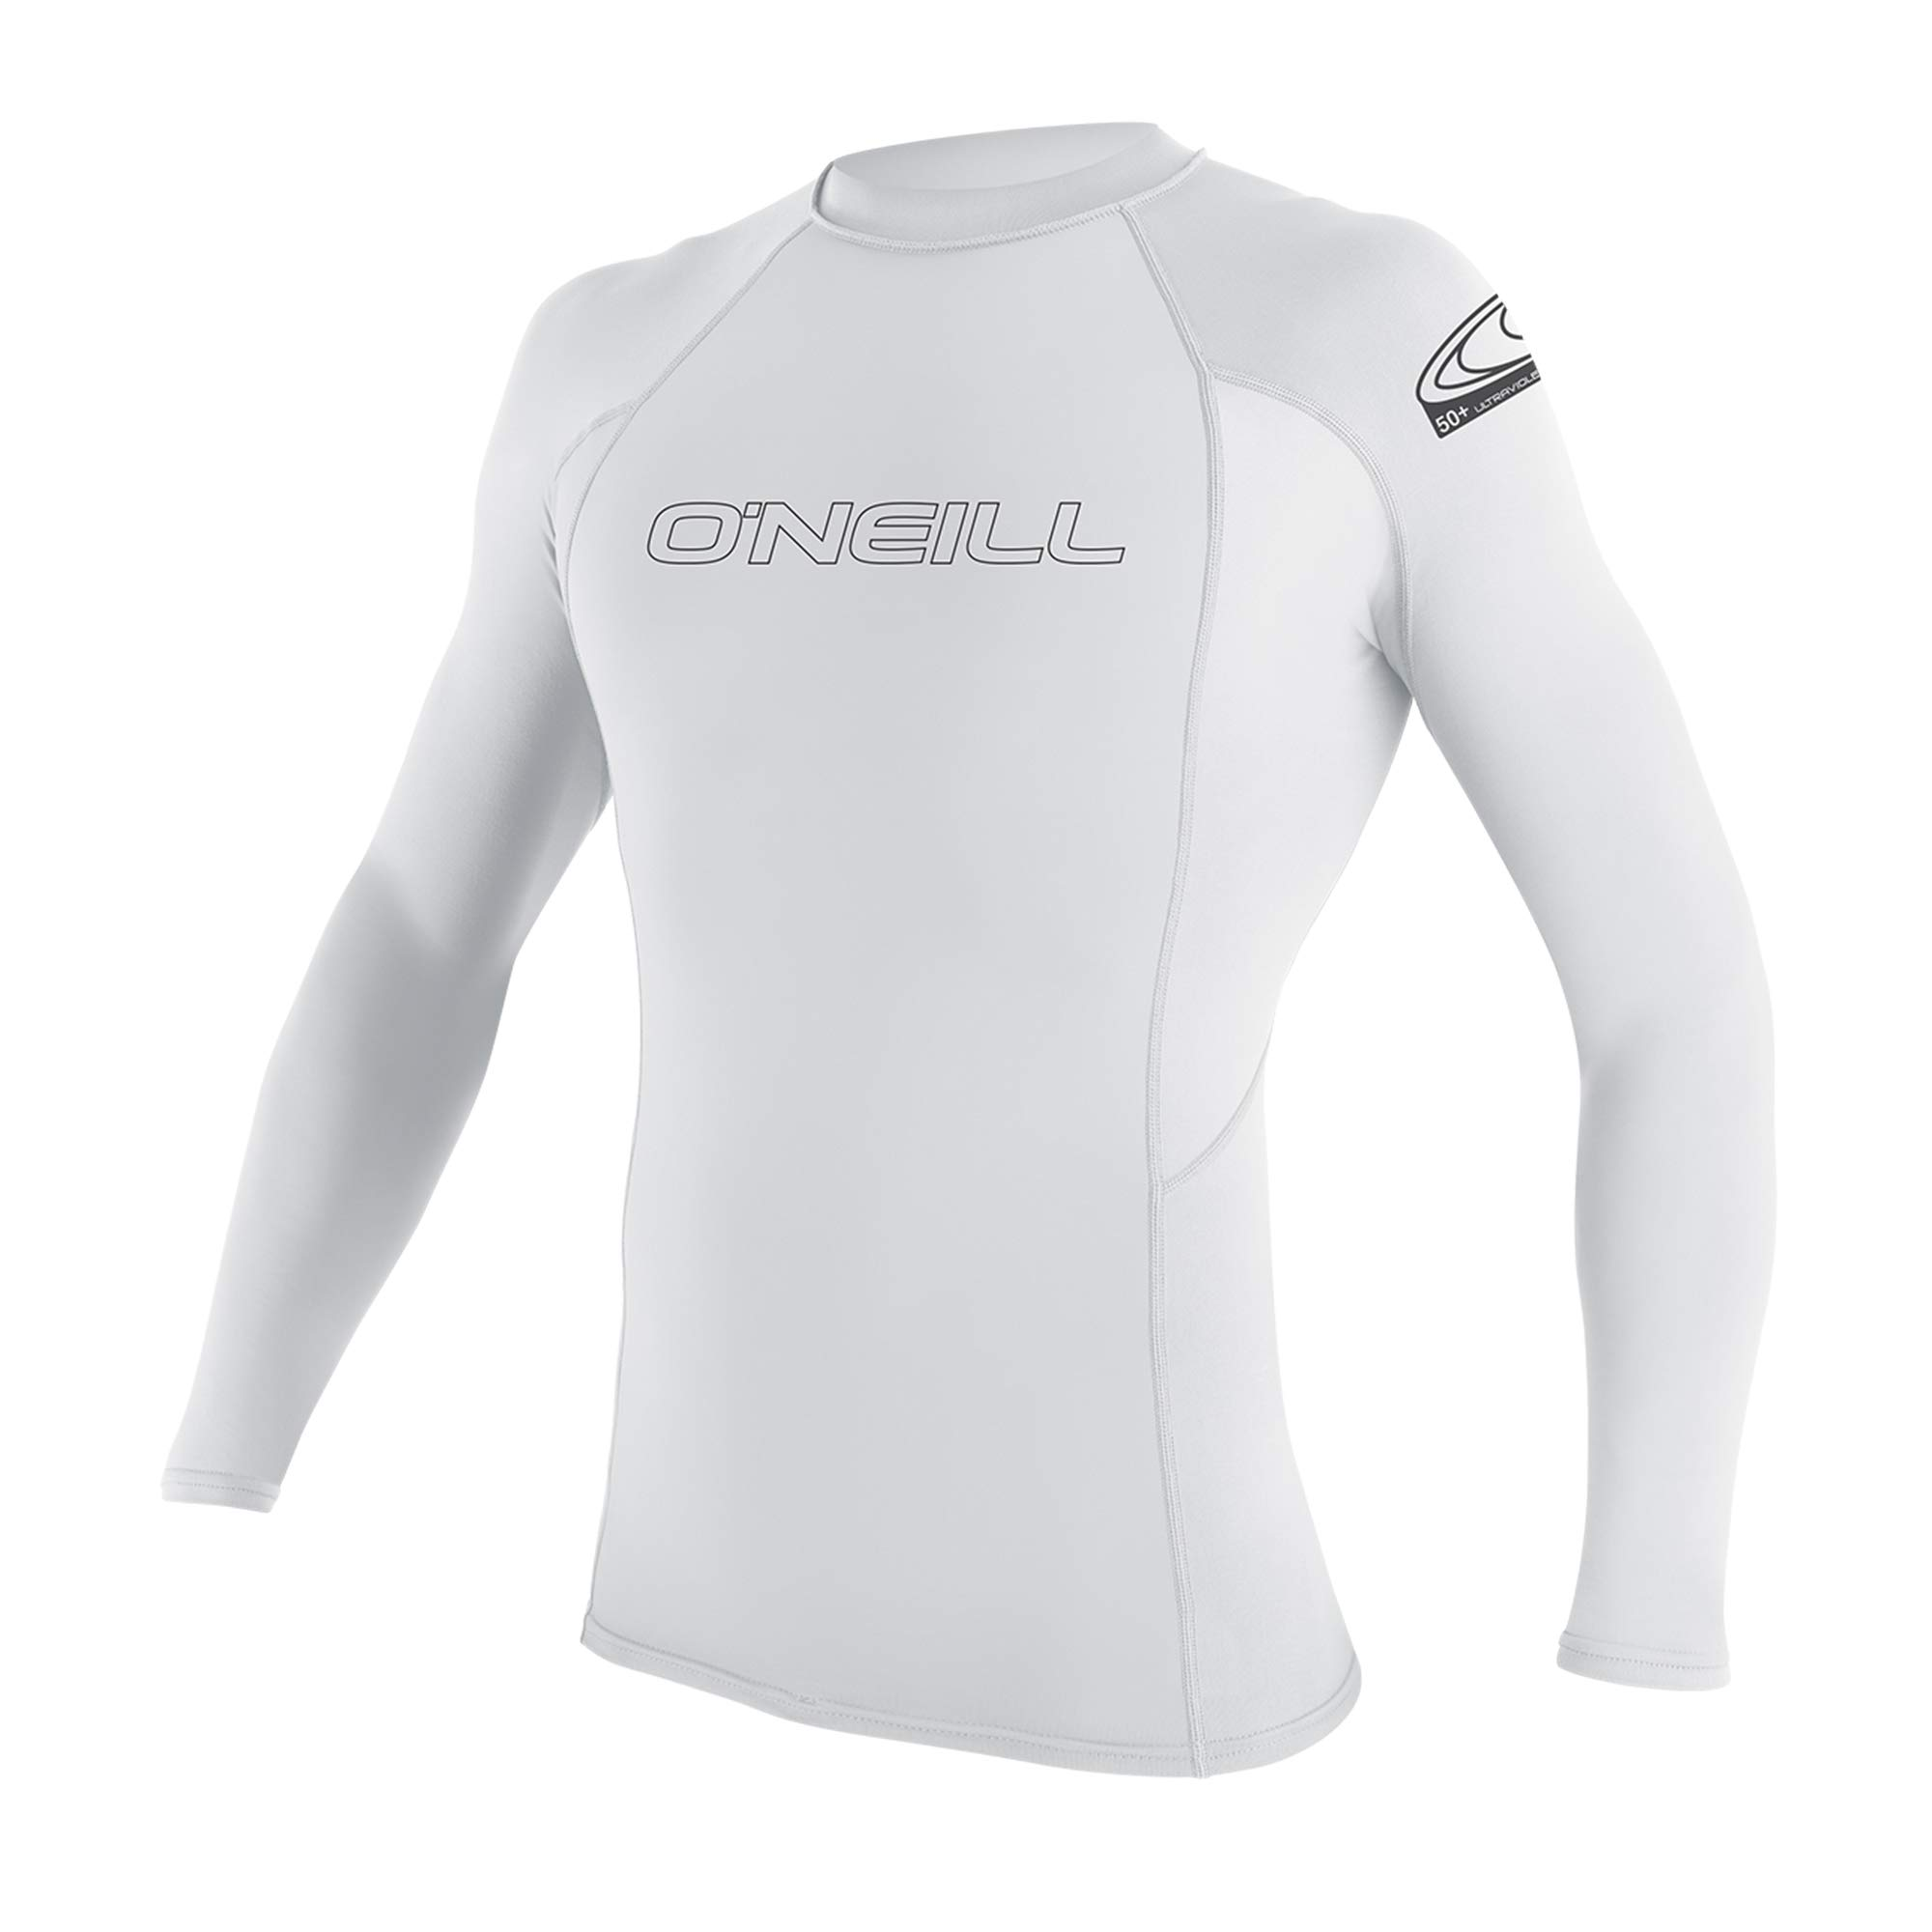 O'Neill Youth Basic Skins UPF 50+ Long Sleeve Rash Guard, White, 4